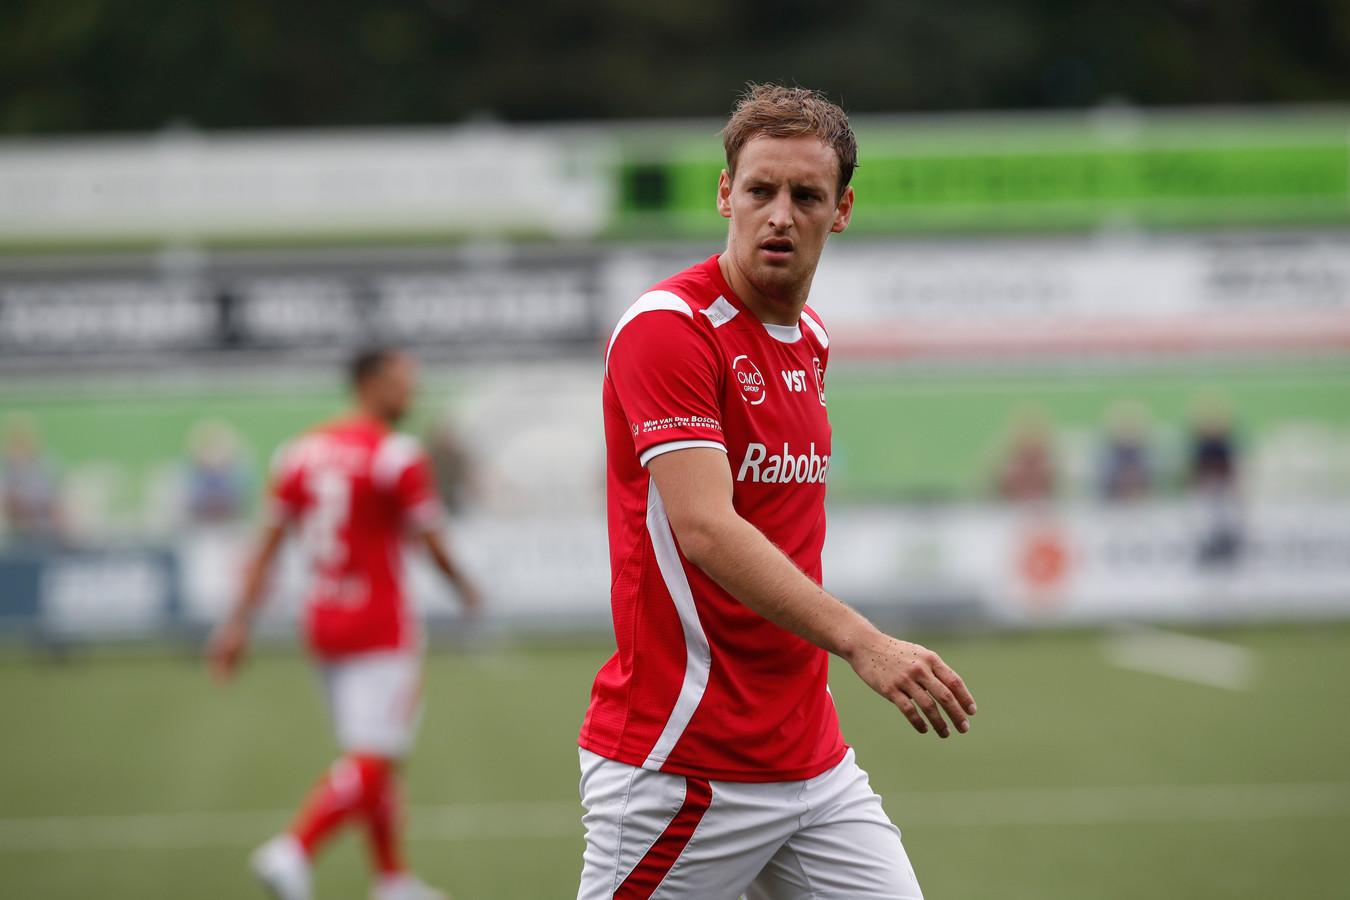 DOVO-speler Simon van Zeelst.